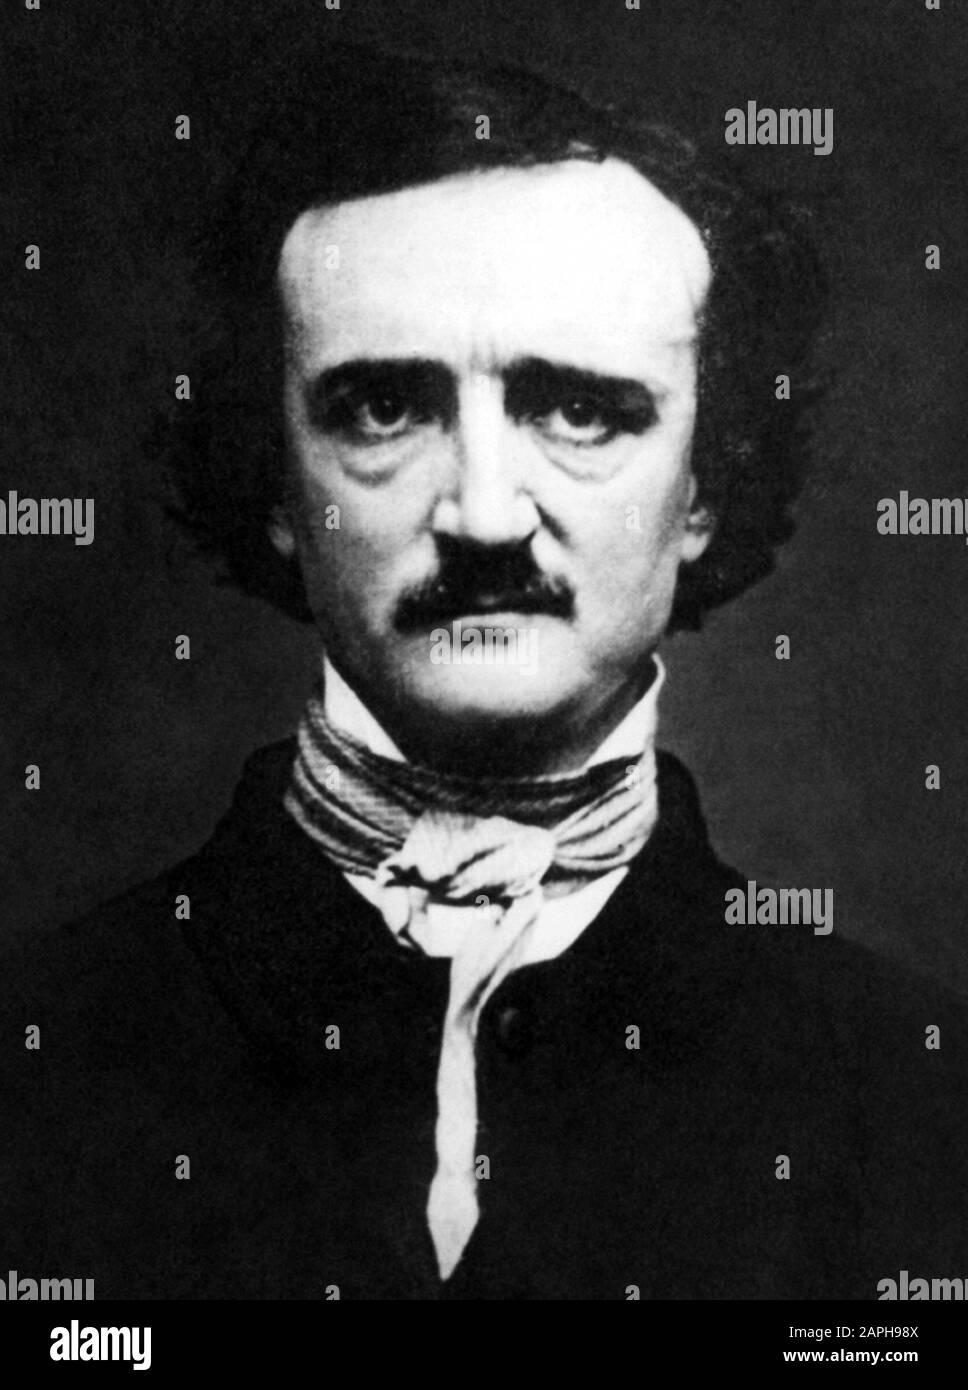 Vintage portrait photo of American writer, poet, editor and literary critic Edgar Allan Poe (1809 – 1849). Daguerreotype photo circa 1848 by W S Hartshorn. Stock Photo